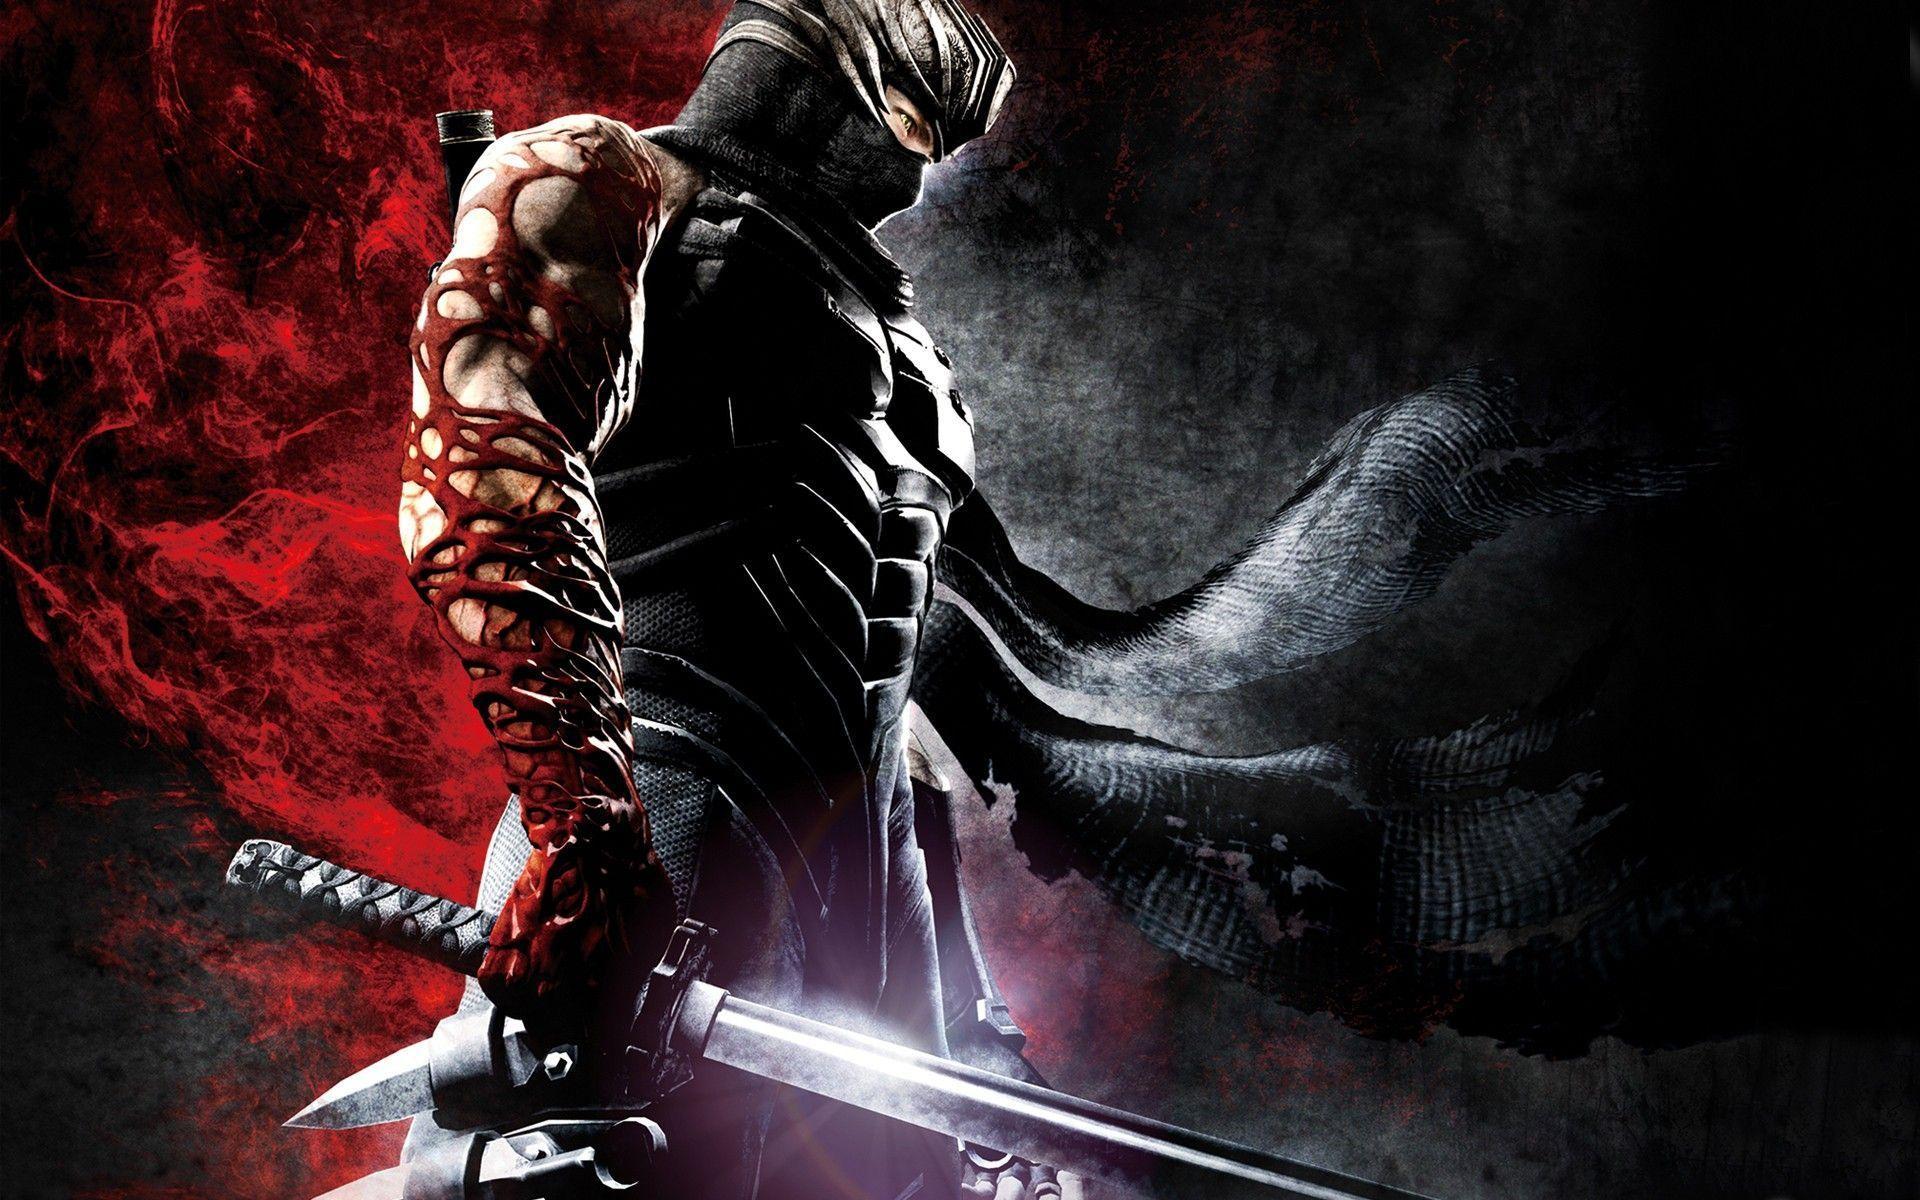 Samurai Ninja Wallpapers Top Free Samurai Ninja